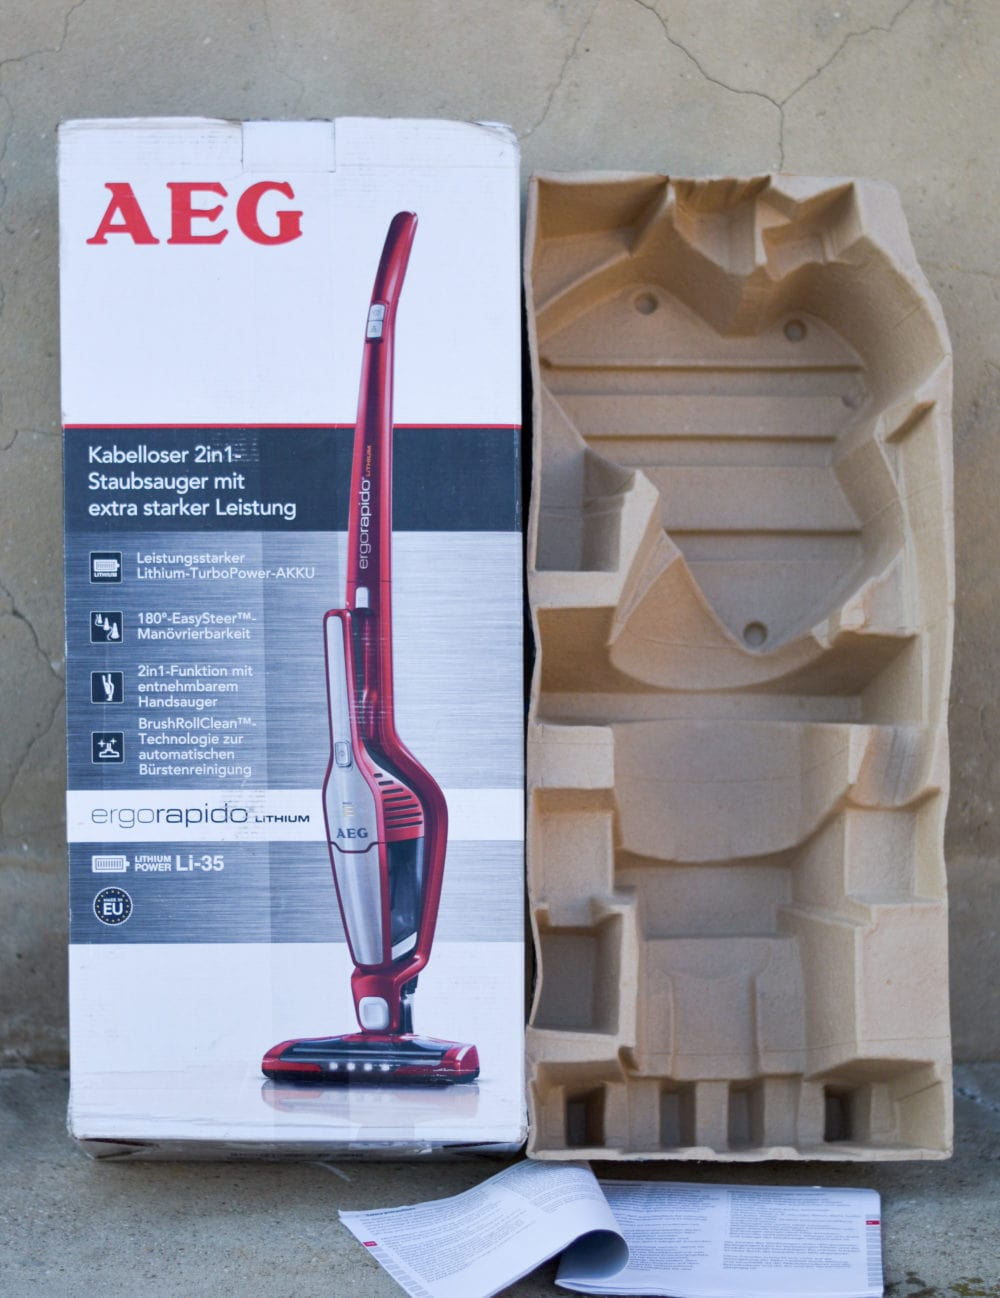 Verpackung AEG Ergorapido